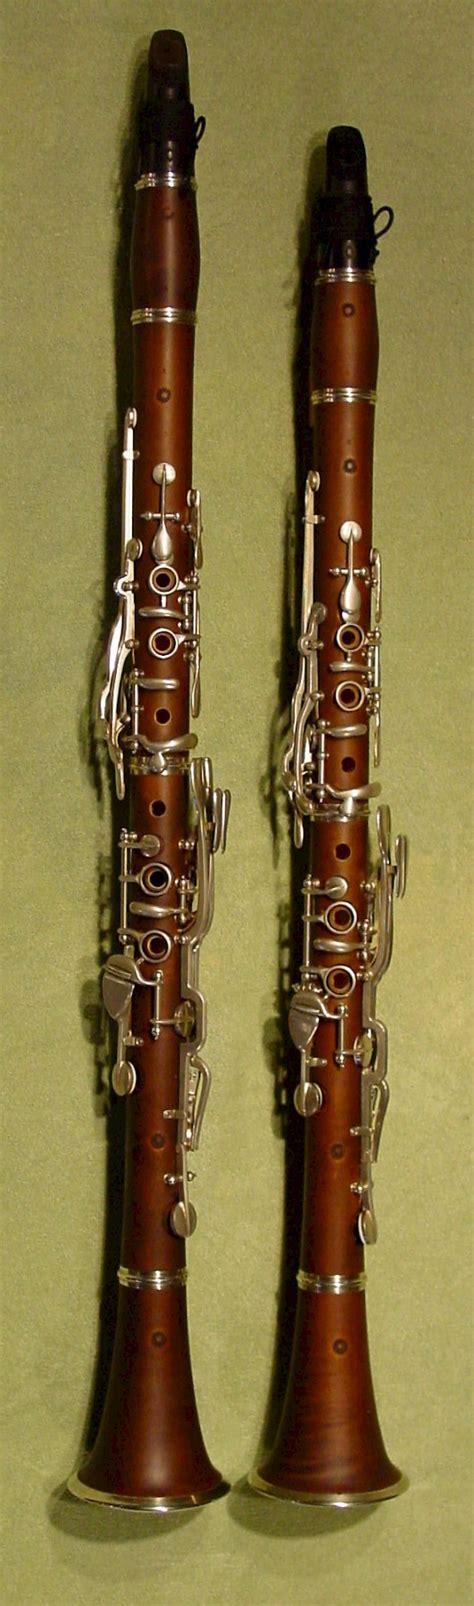 klarinetten historische holzblasinstrumente andreas schoeni